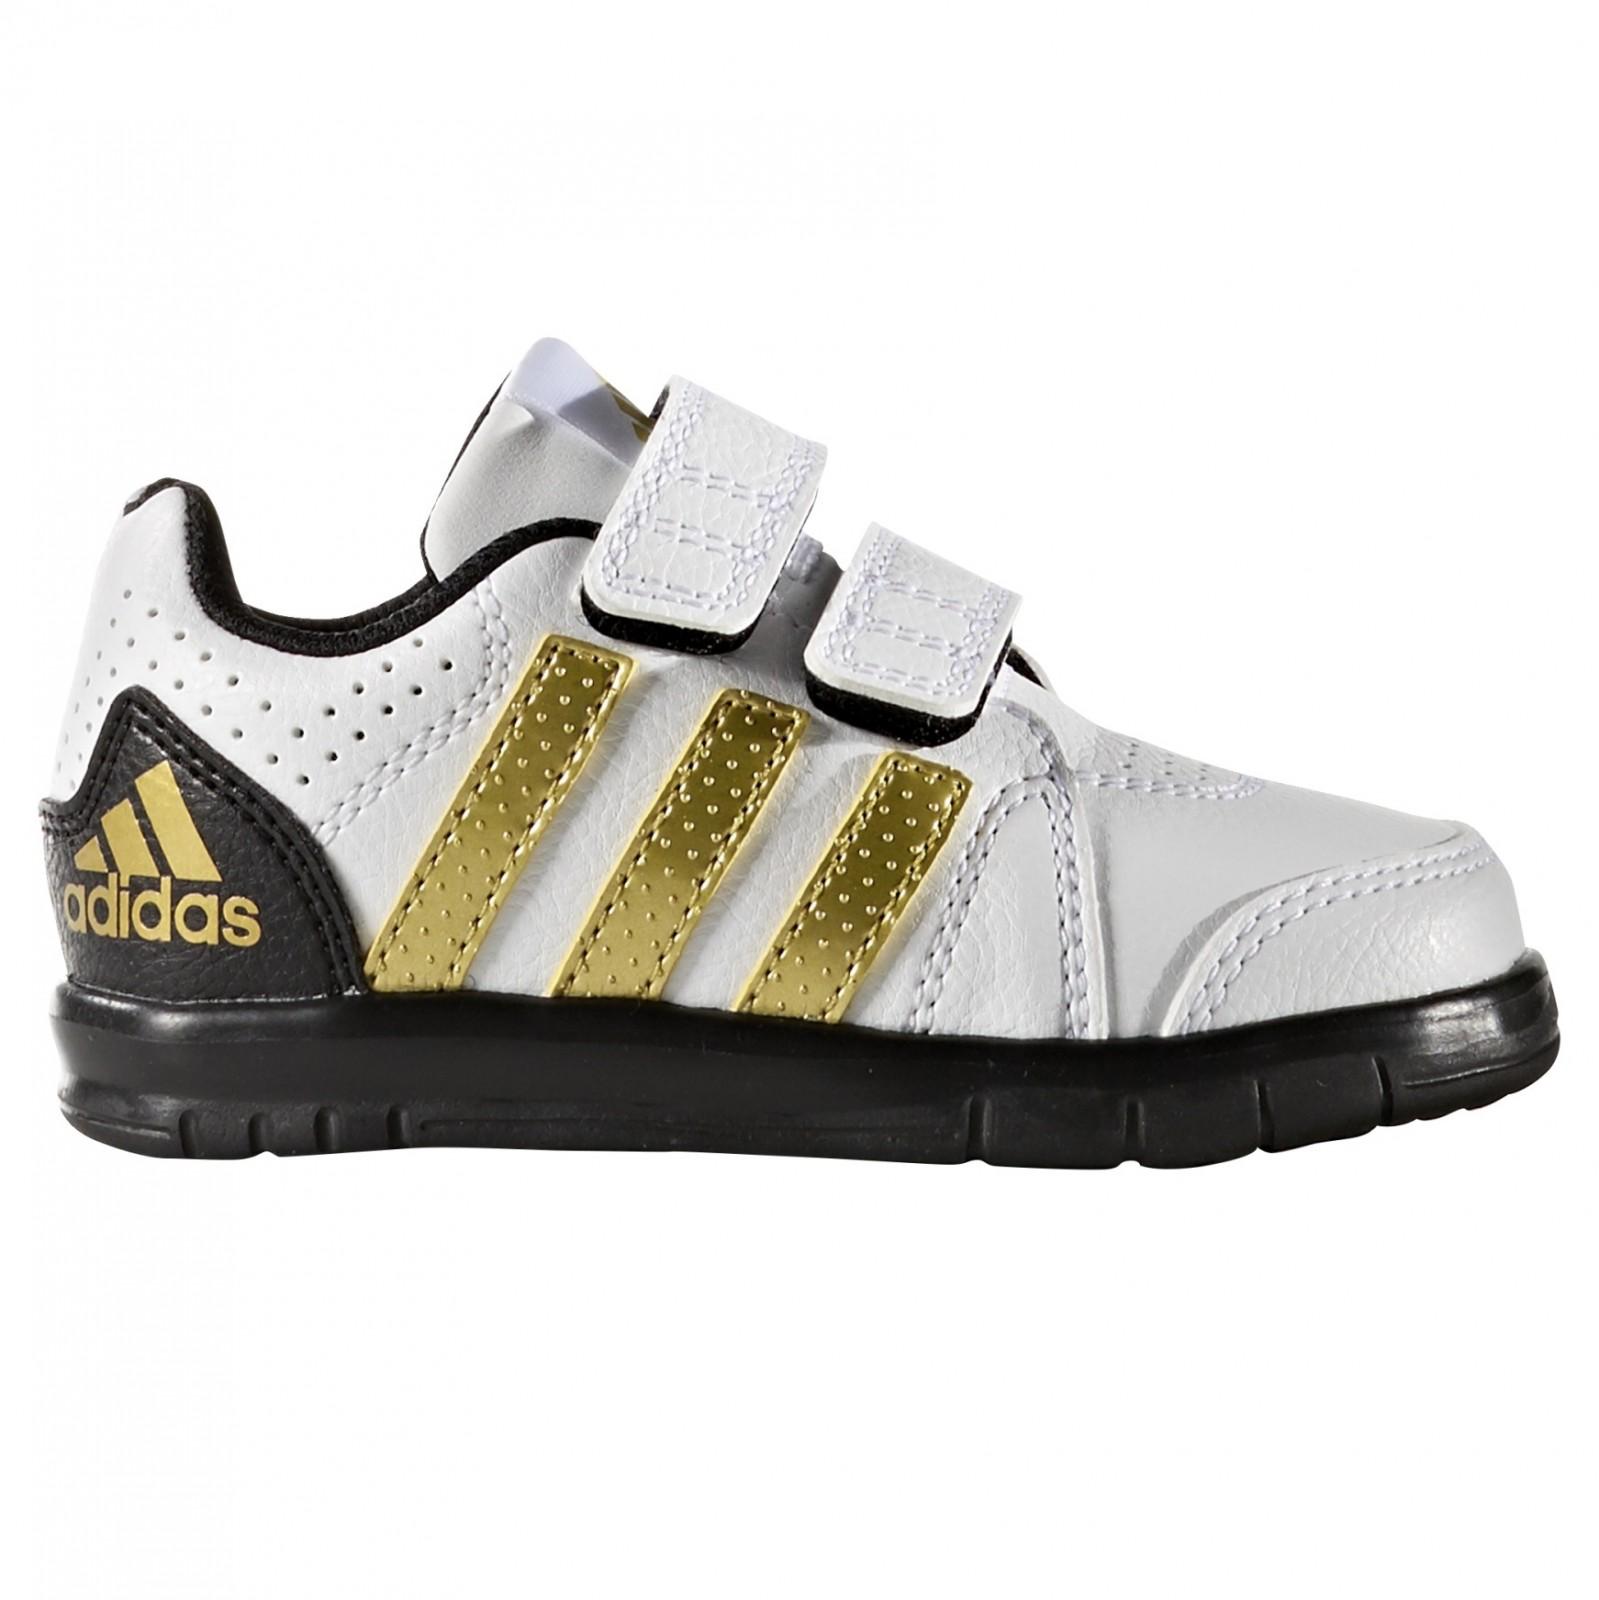 Dětské boty adidas Performance FB LK Trainer 7 CF I  880a40243a